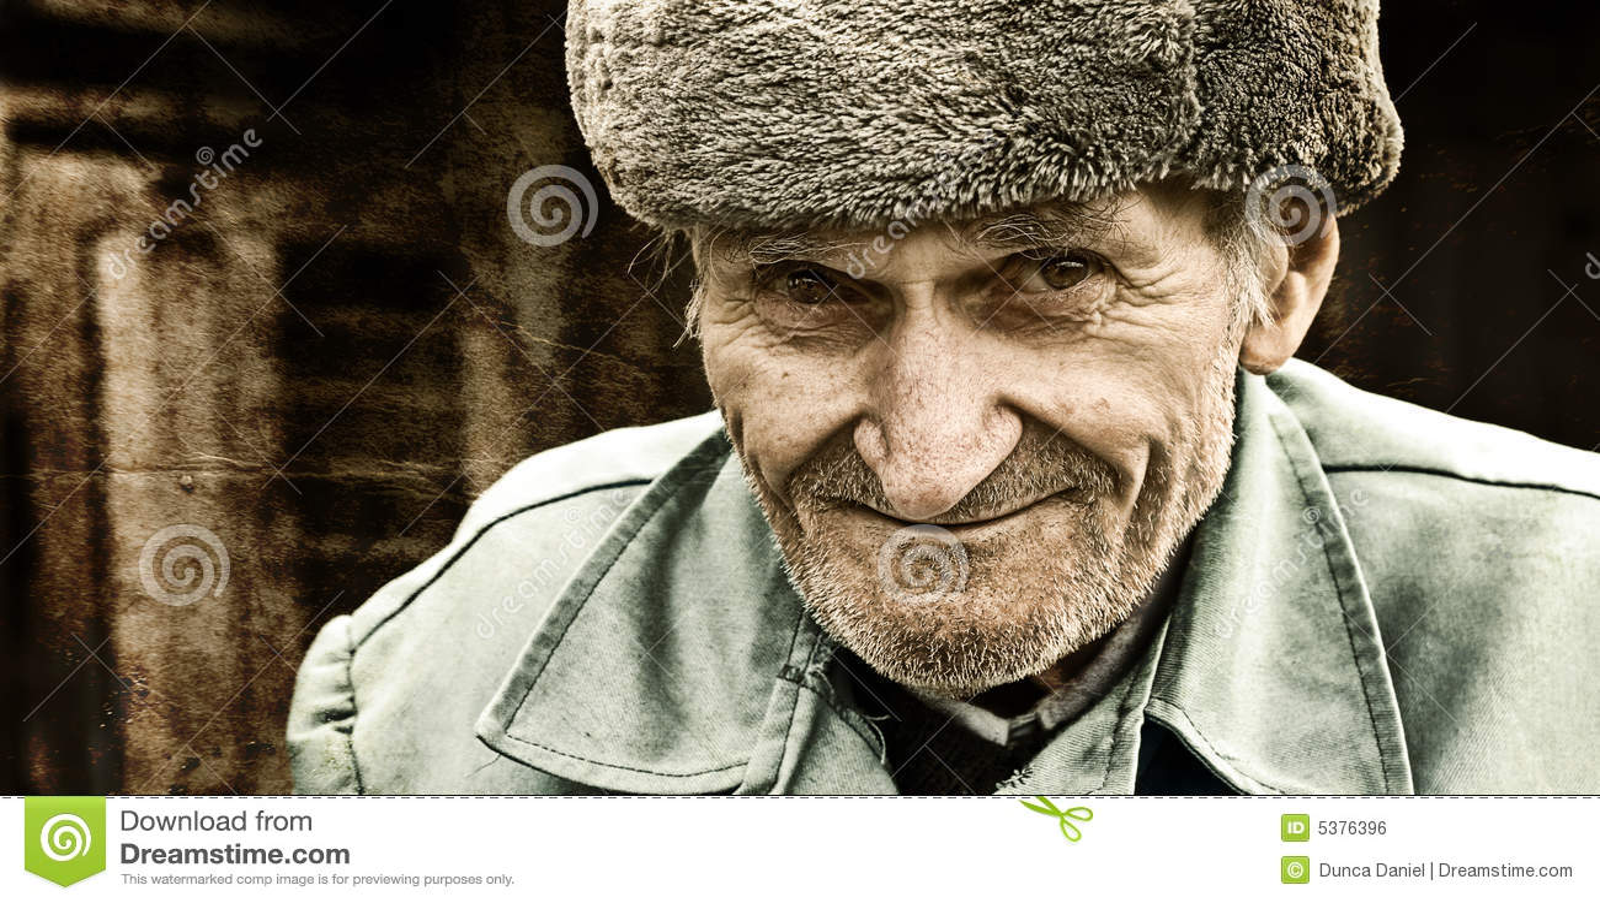 Vintage artistic portrait of one senior man